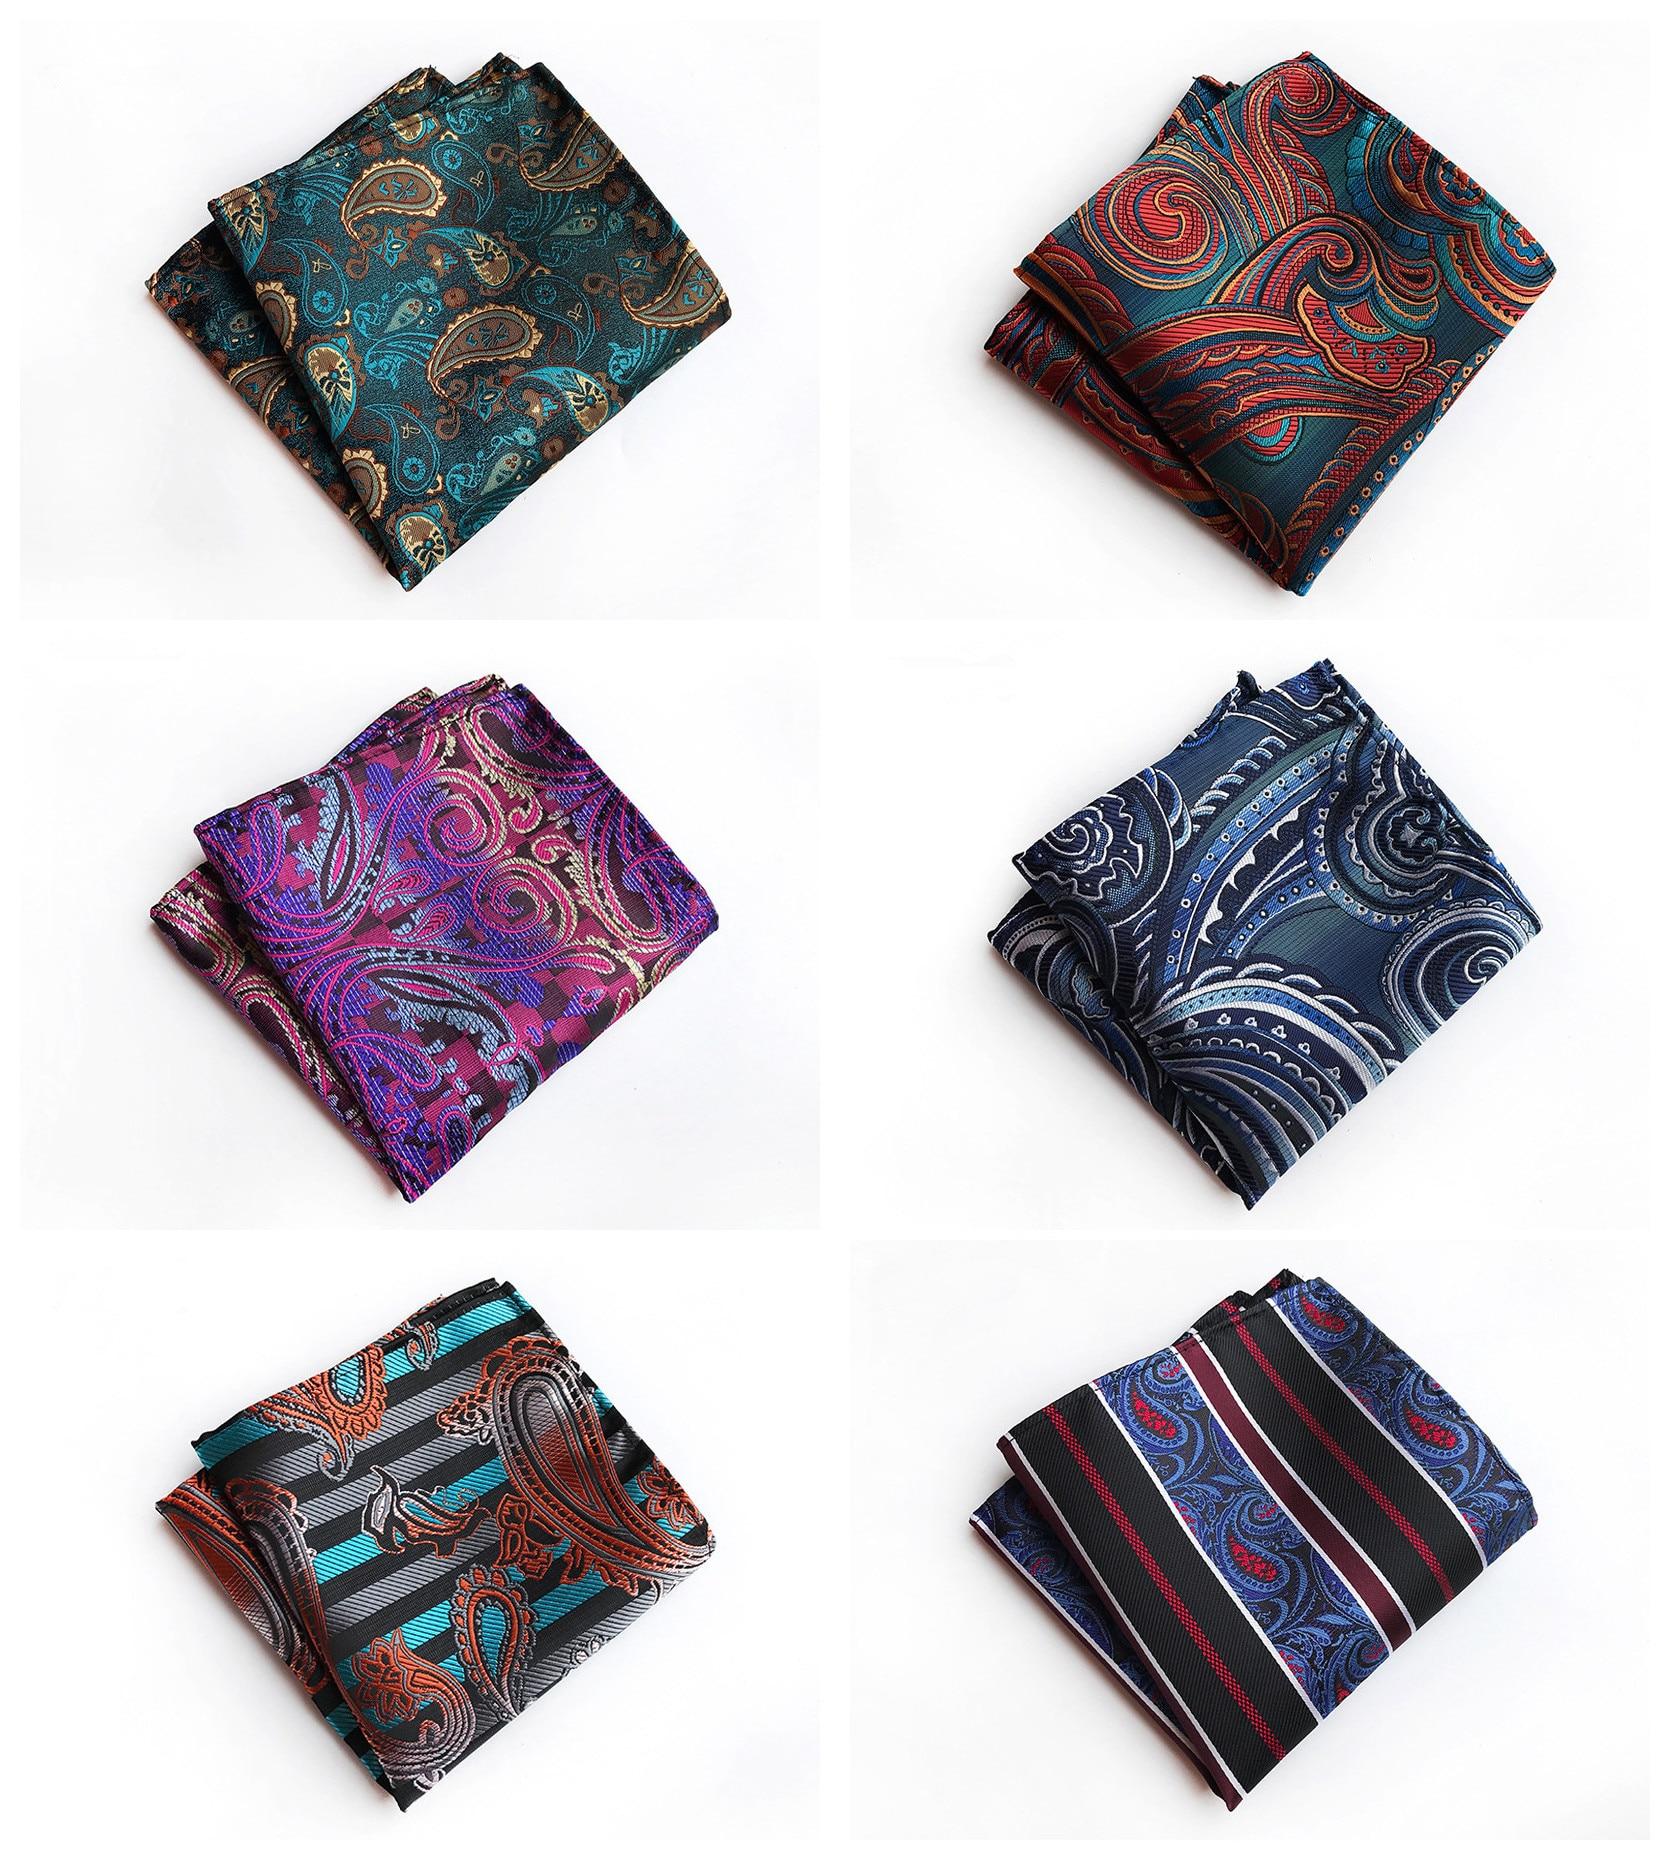 Fashion Quality Polyester Paisley Pocket Towel High-end Design Business Retro Men's Quality Decorative Handkerchief Pocket Towel